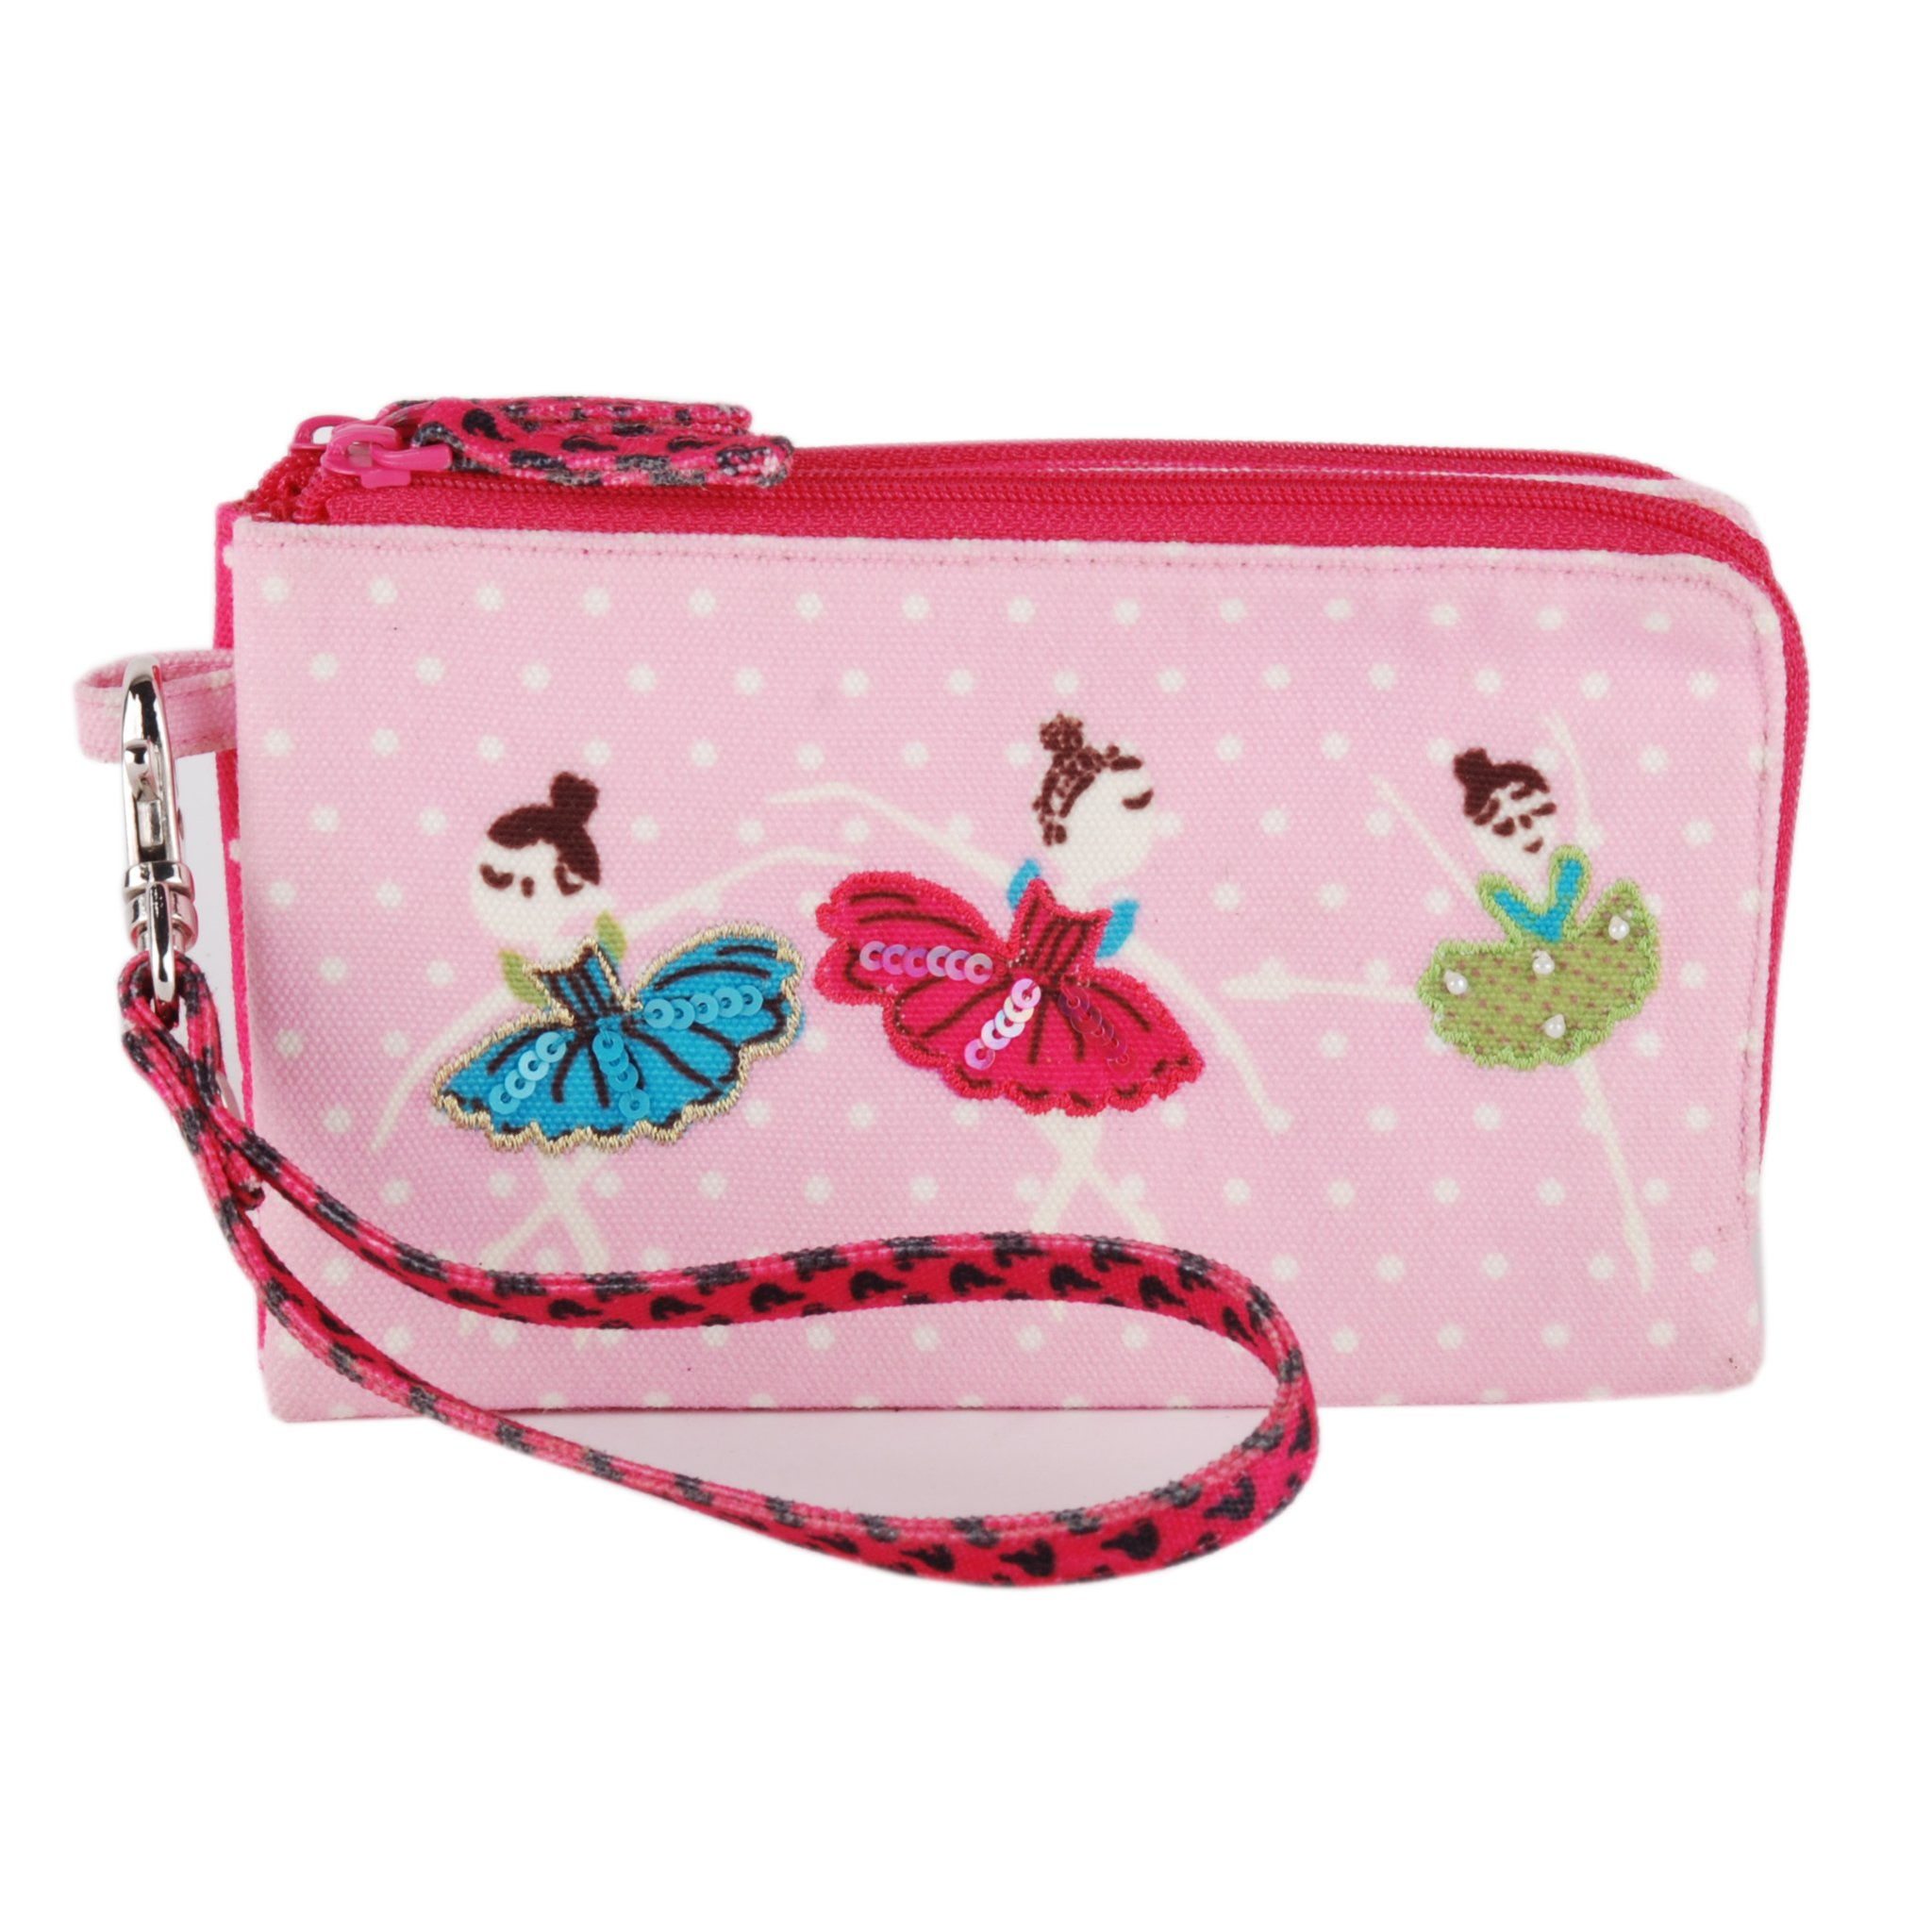 Wristlet removable clutch travel bag purse money pouch wallet organizer by Pinaken (Image #1)